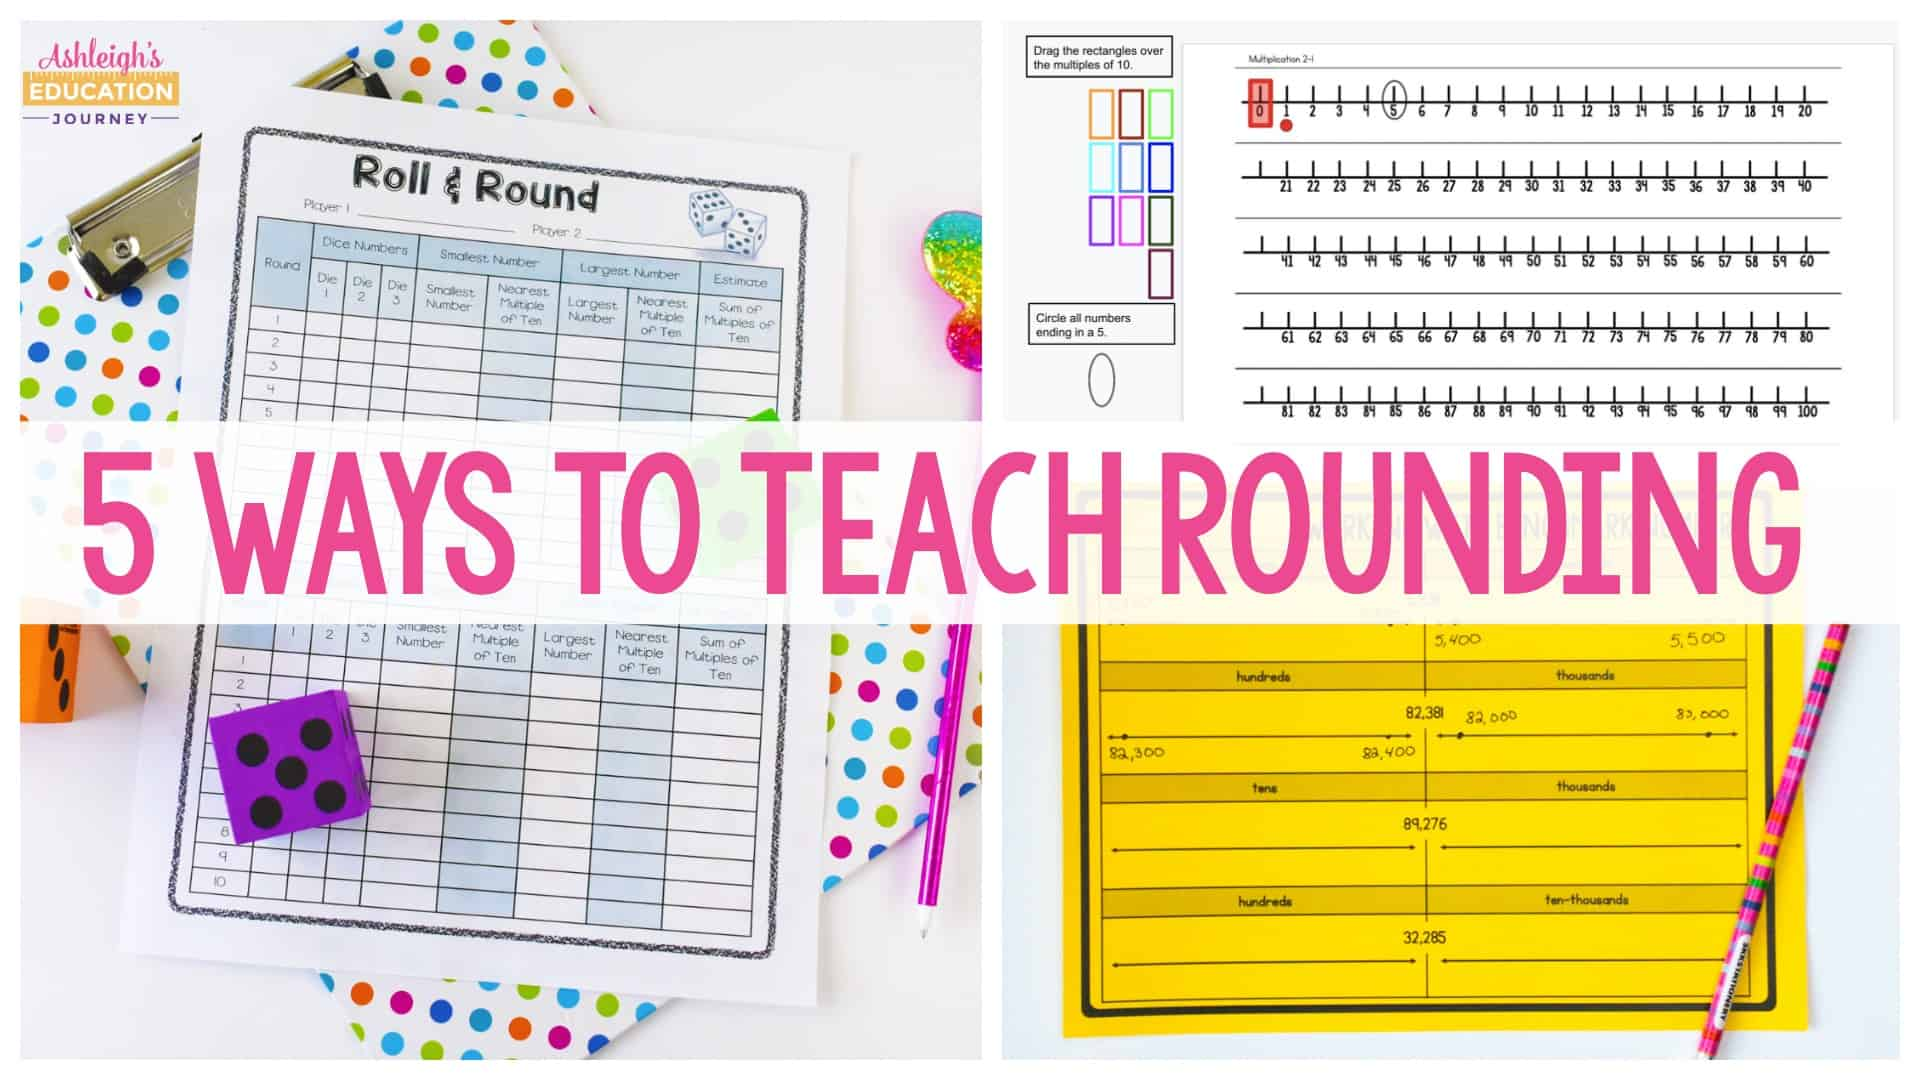 5 Ways to Teach Rounding